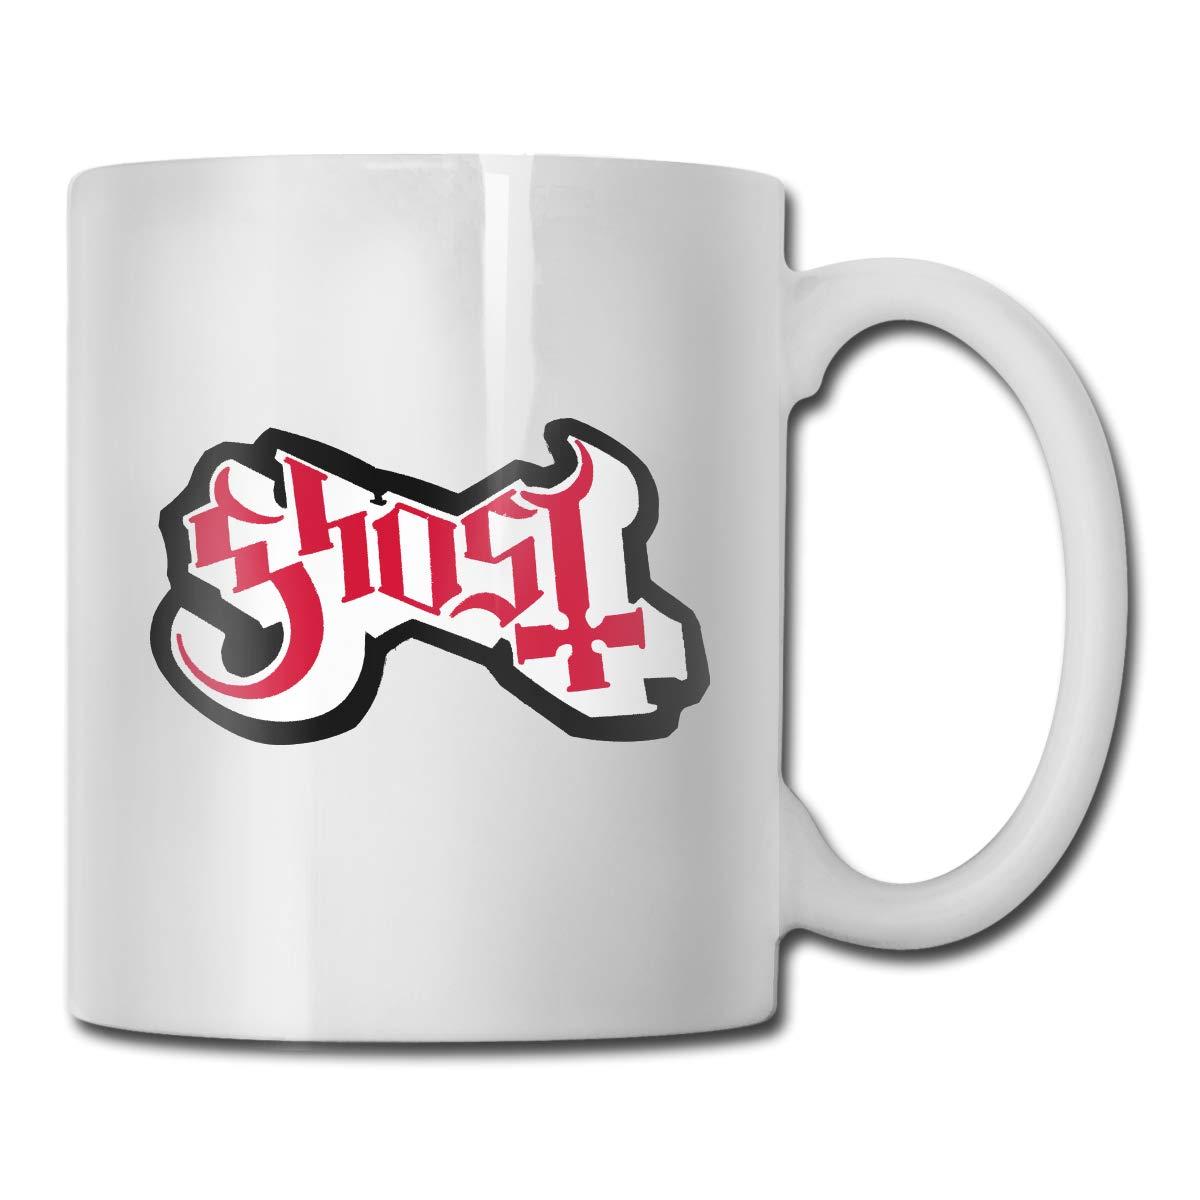 Office Coffee Cup GhostLogoHeavyMetal Geblackus 14.72 OZ Capacity Mug is Perfect for CoffeeWhite